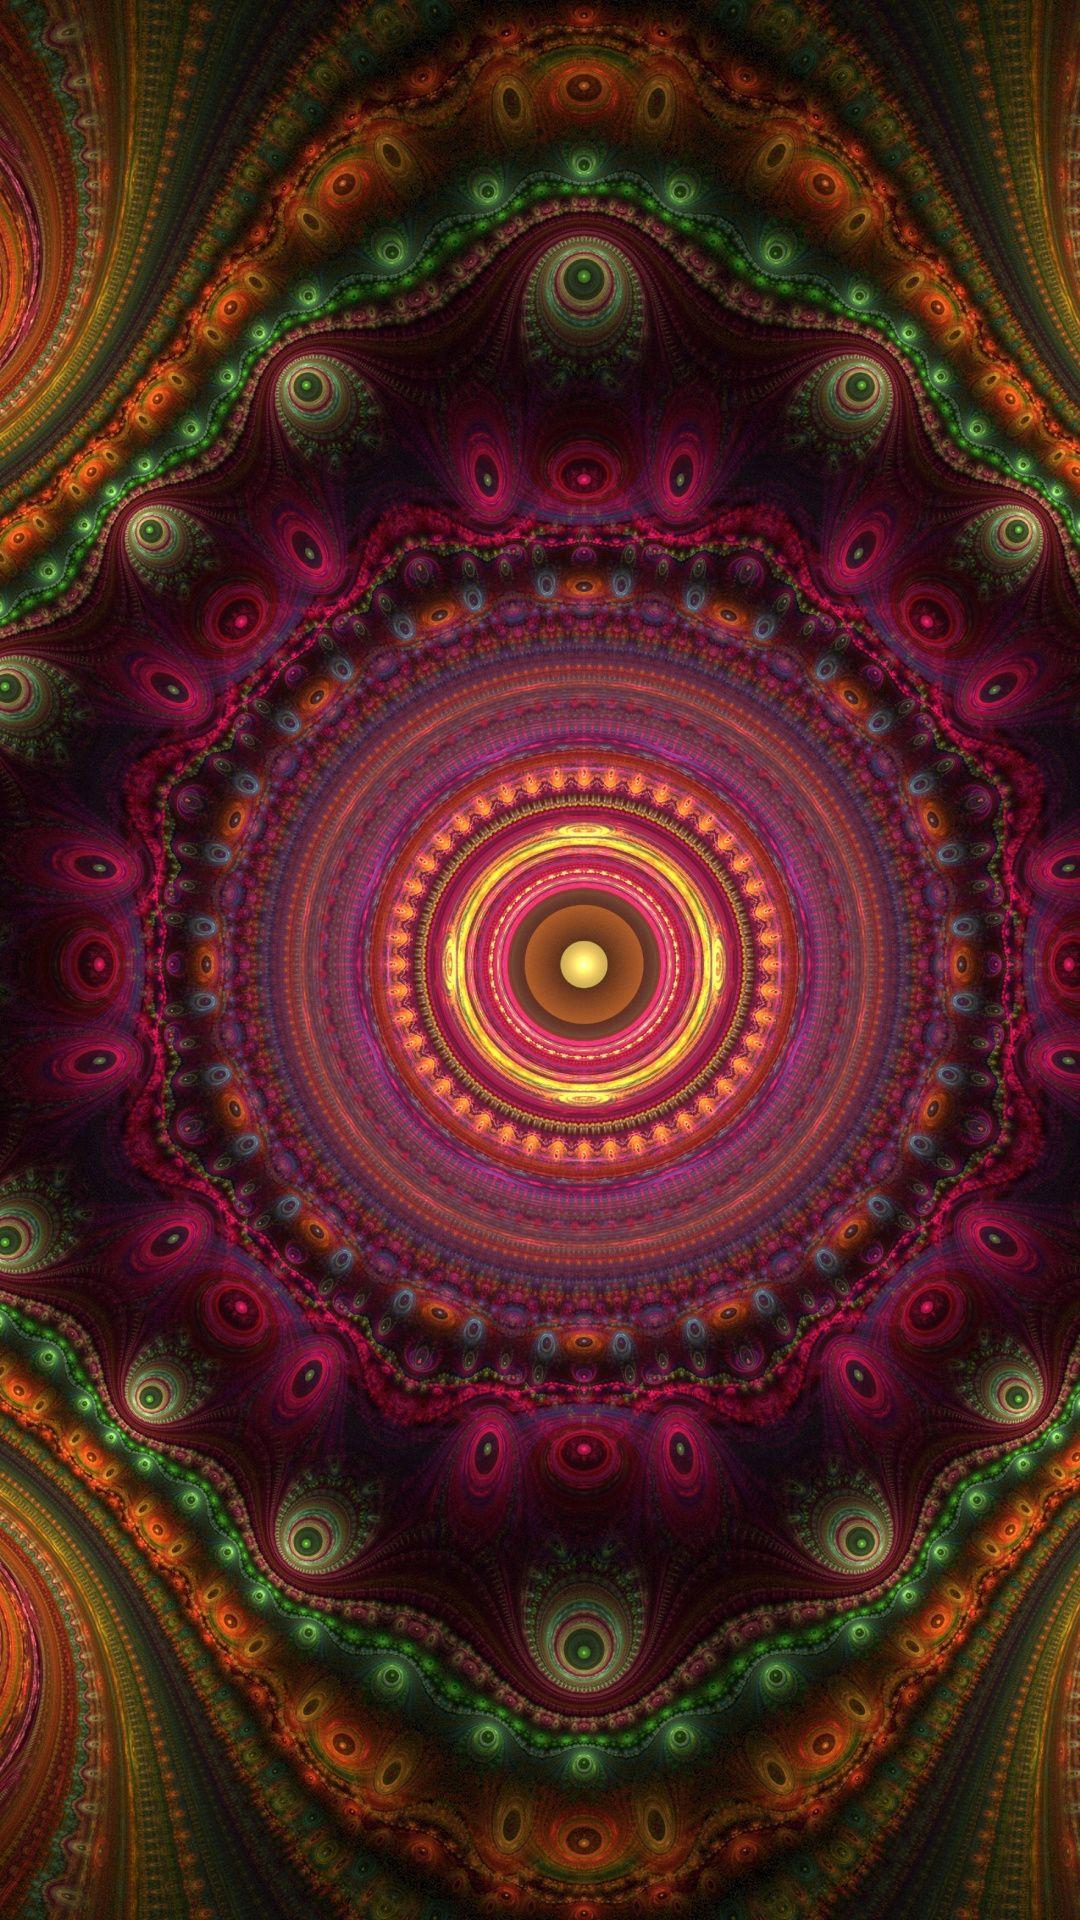 1080x1920 Artwork  Fractal  Pattern  Kaleidoscope Wallpaper